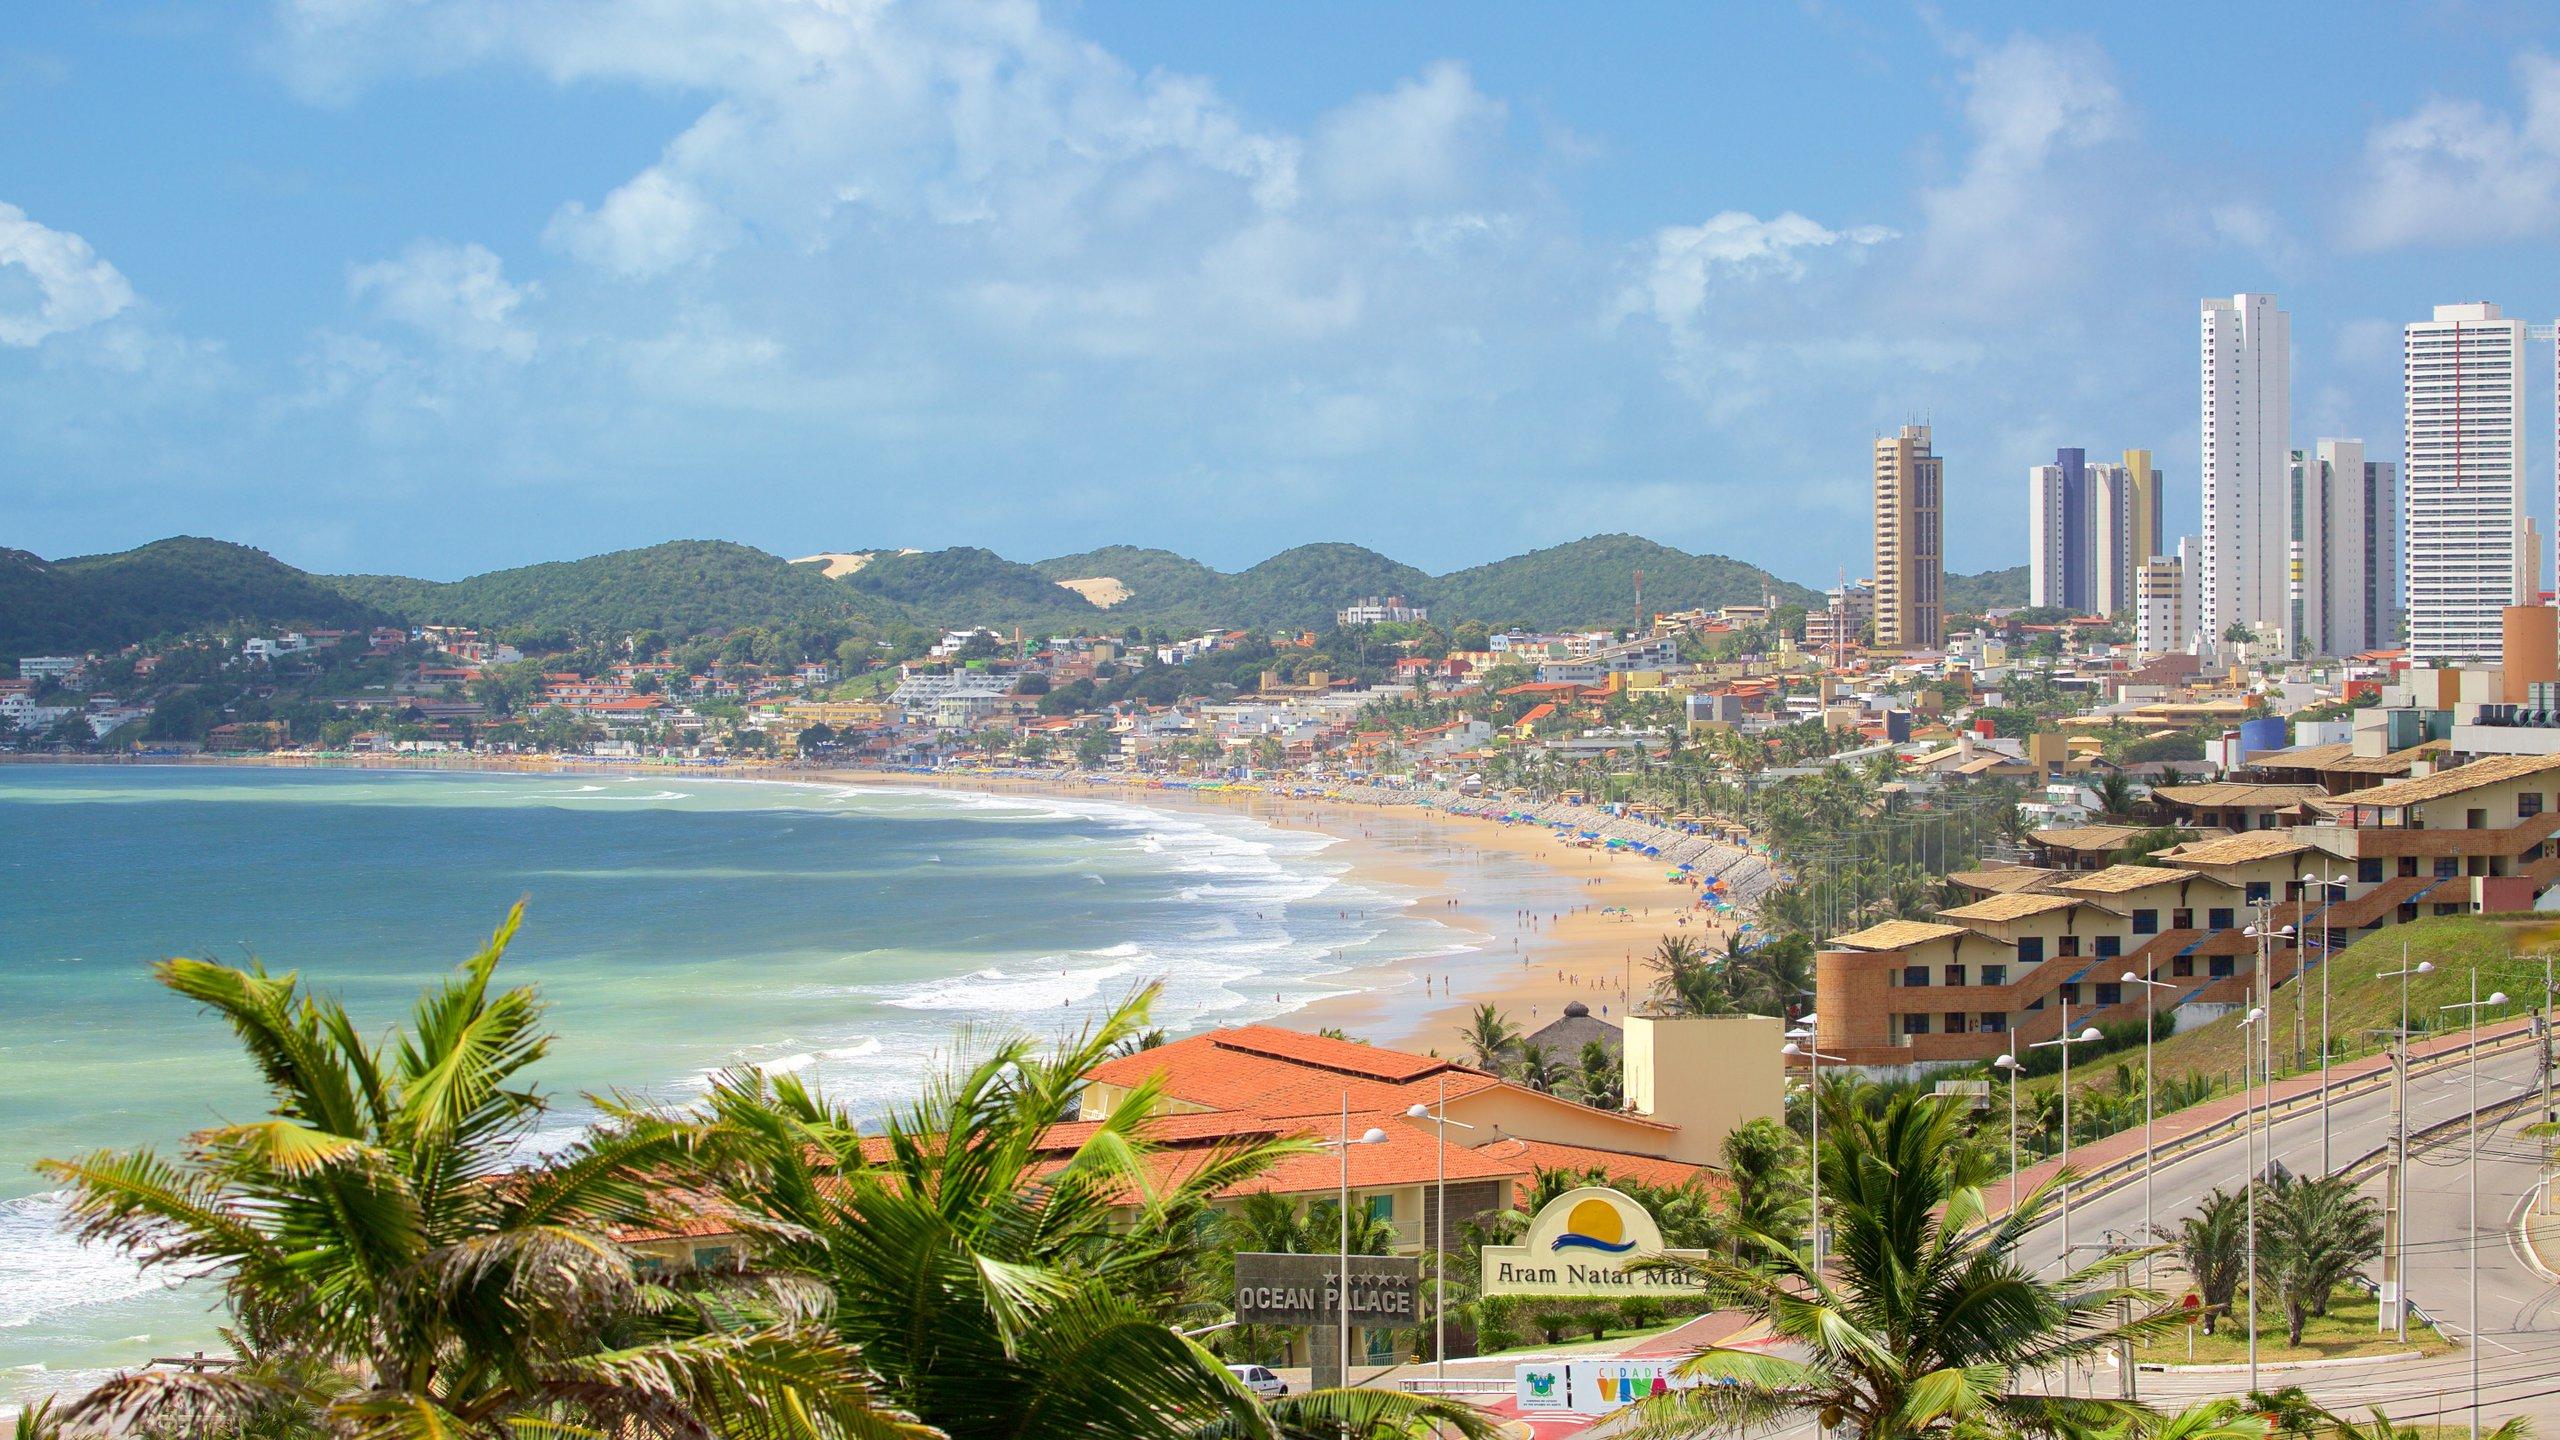 Ponta Negra, Natal, Rio Grande do Norte (Stato), Brasile